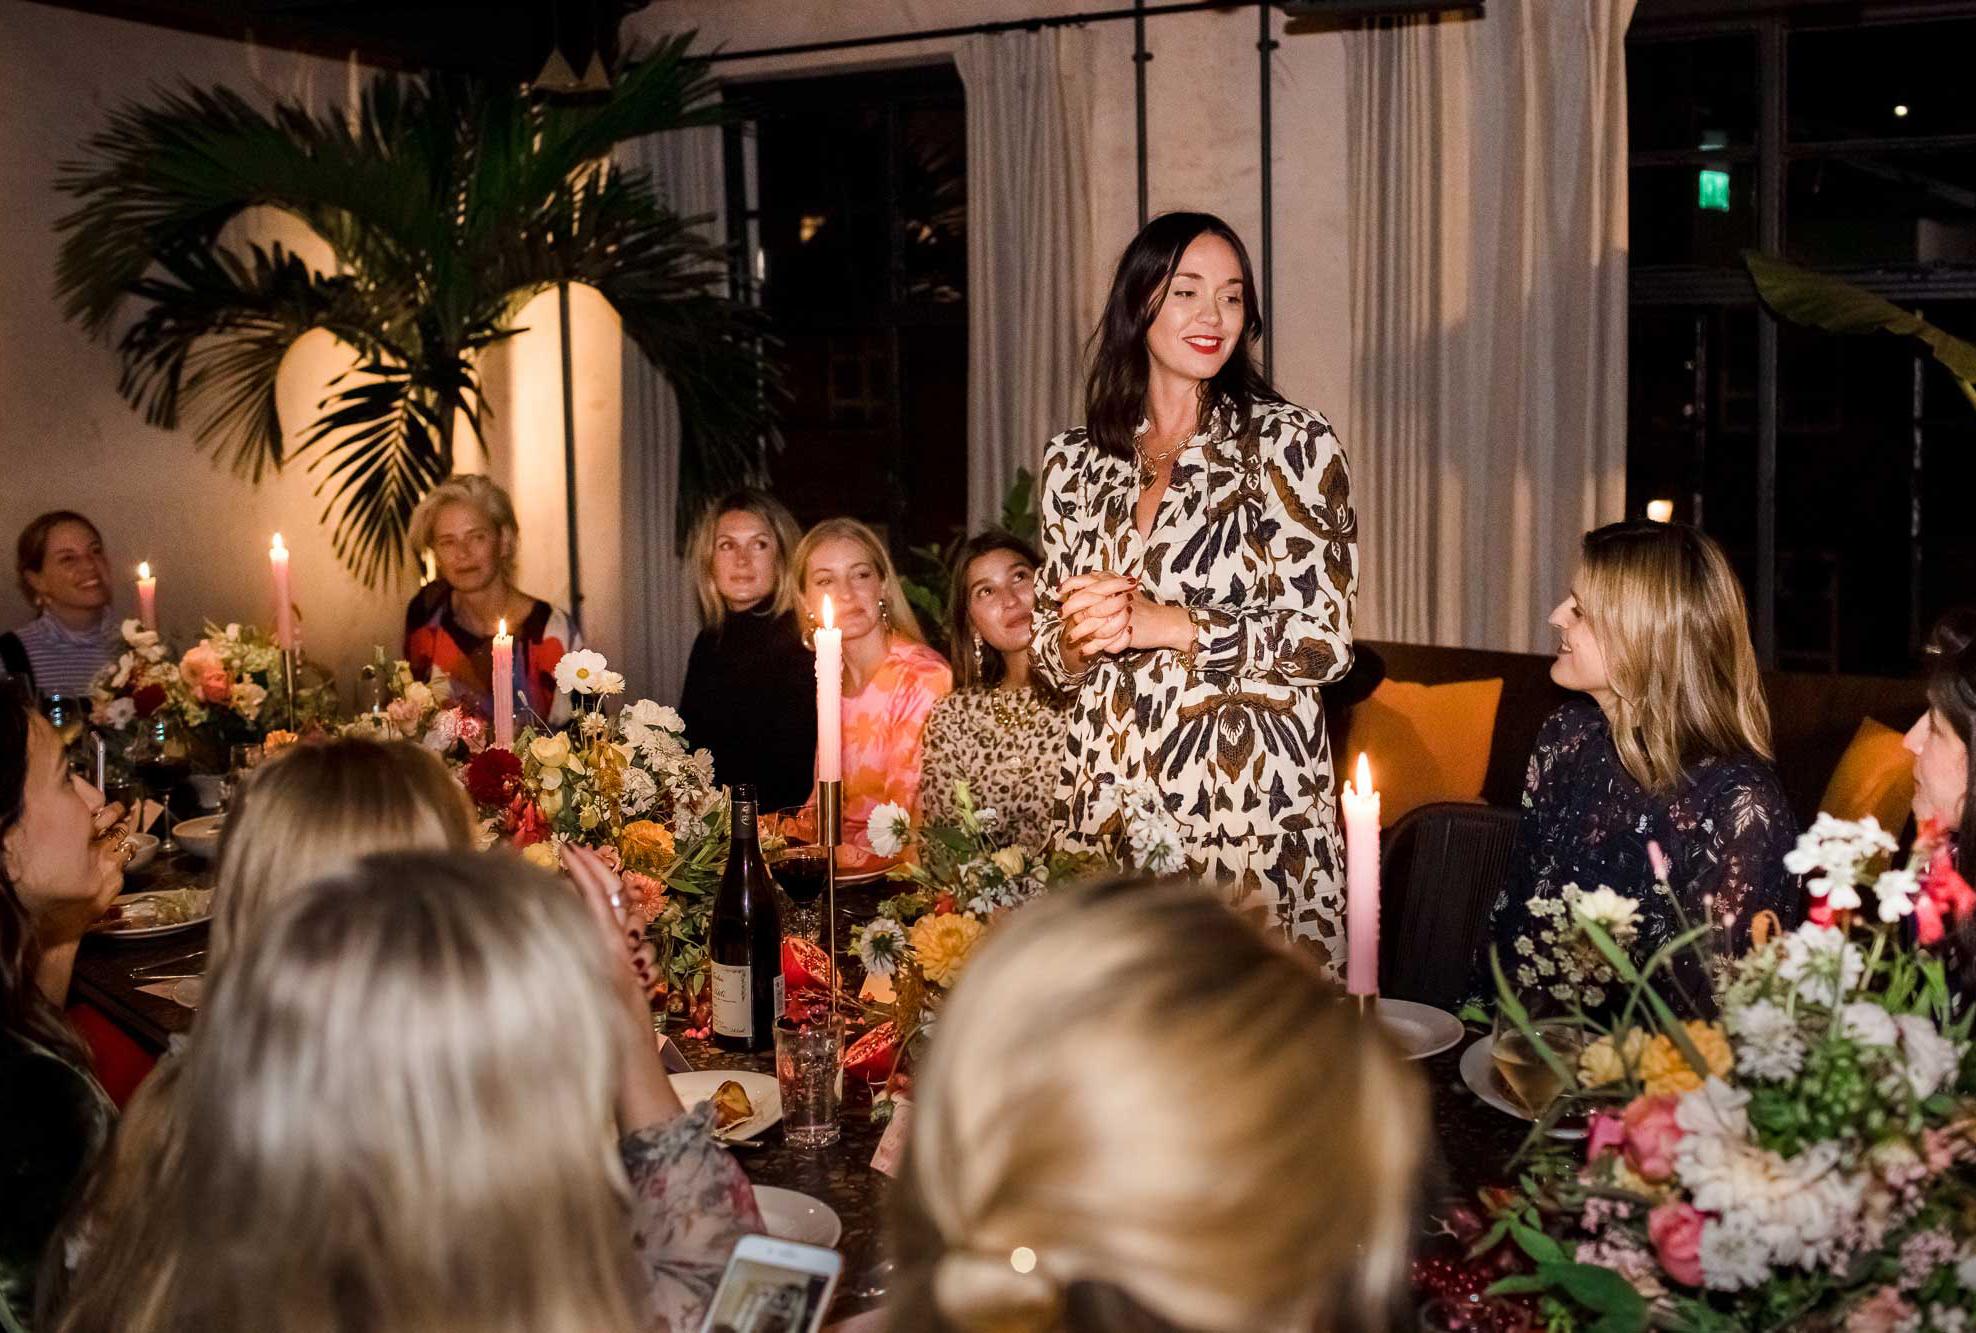 Jennifer Grant's Bespoke Stationery Brand Romeo & Jules Turns One